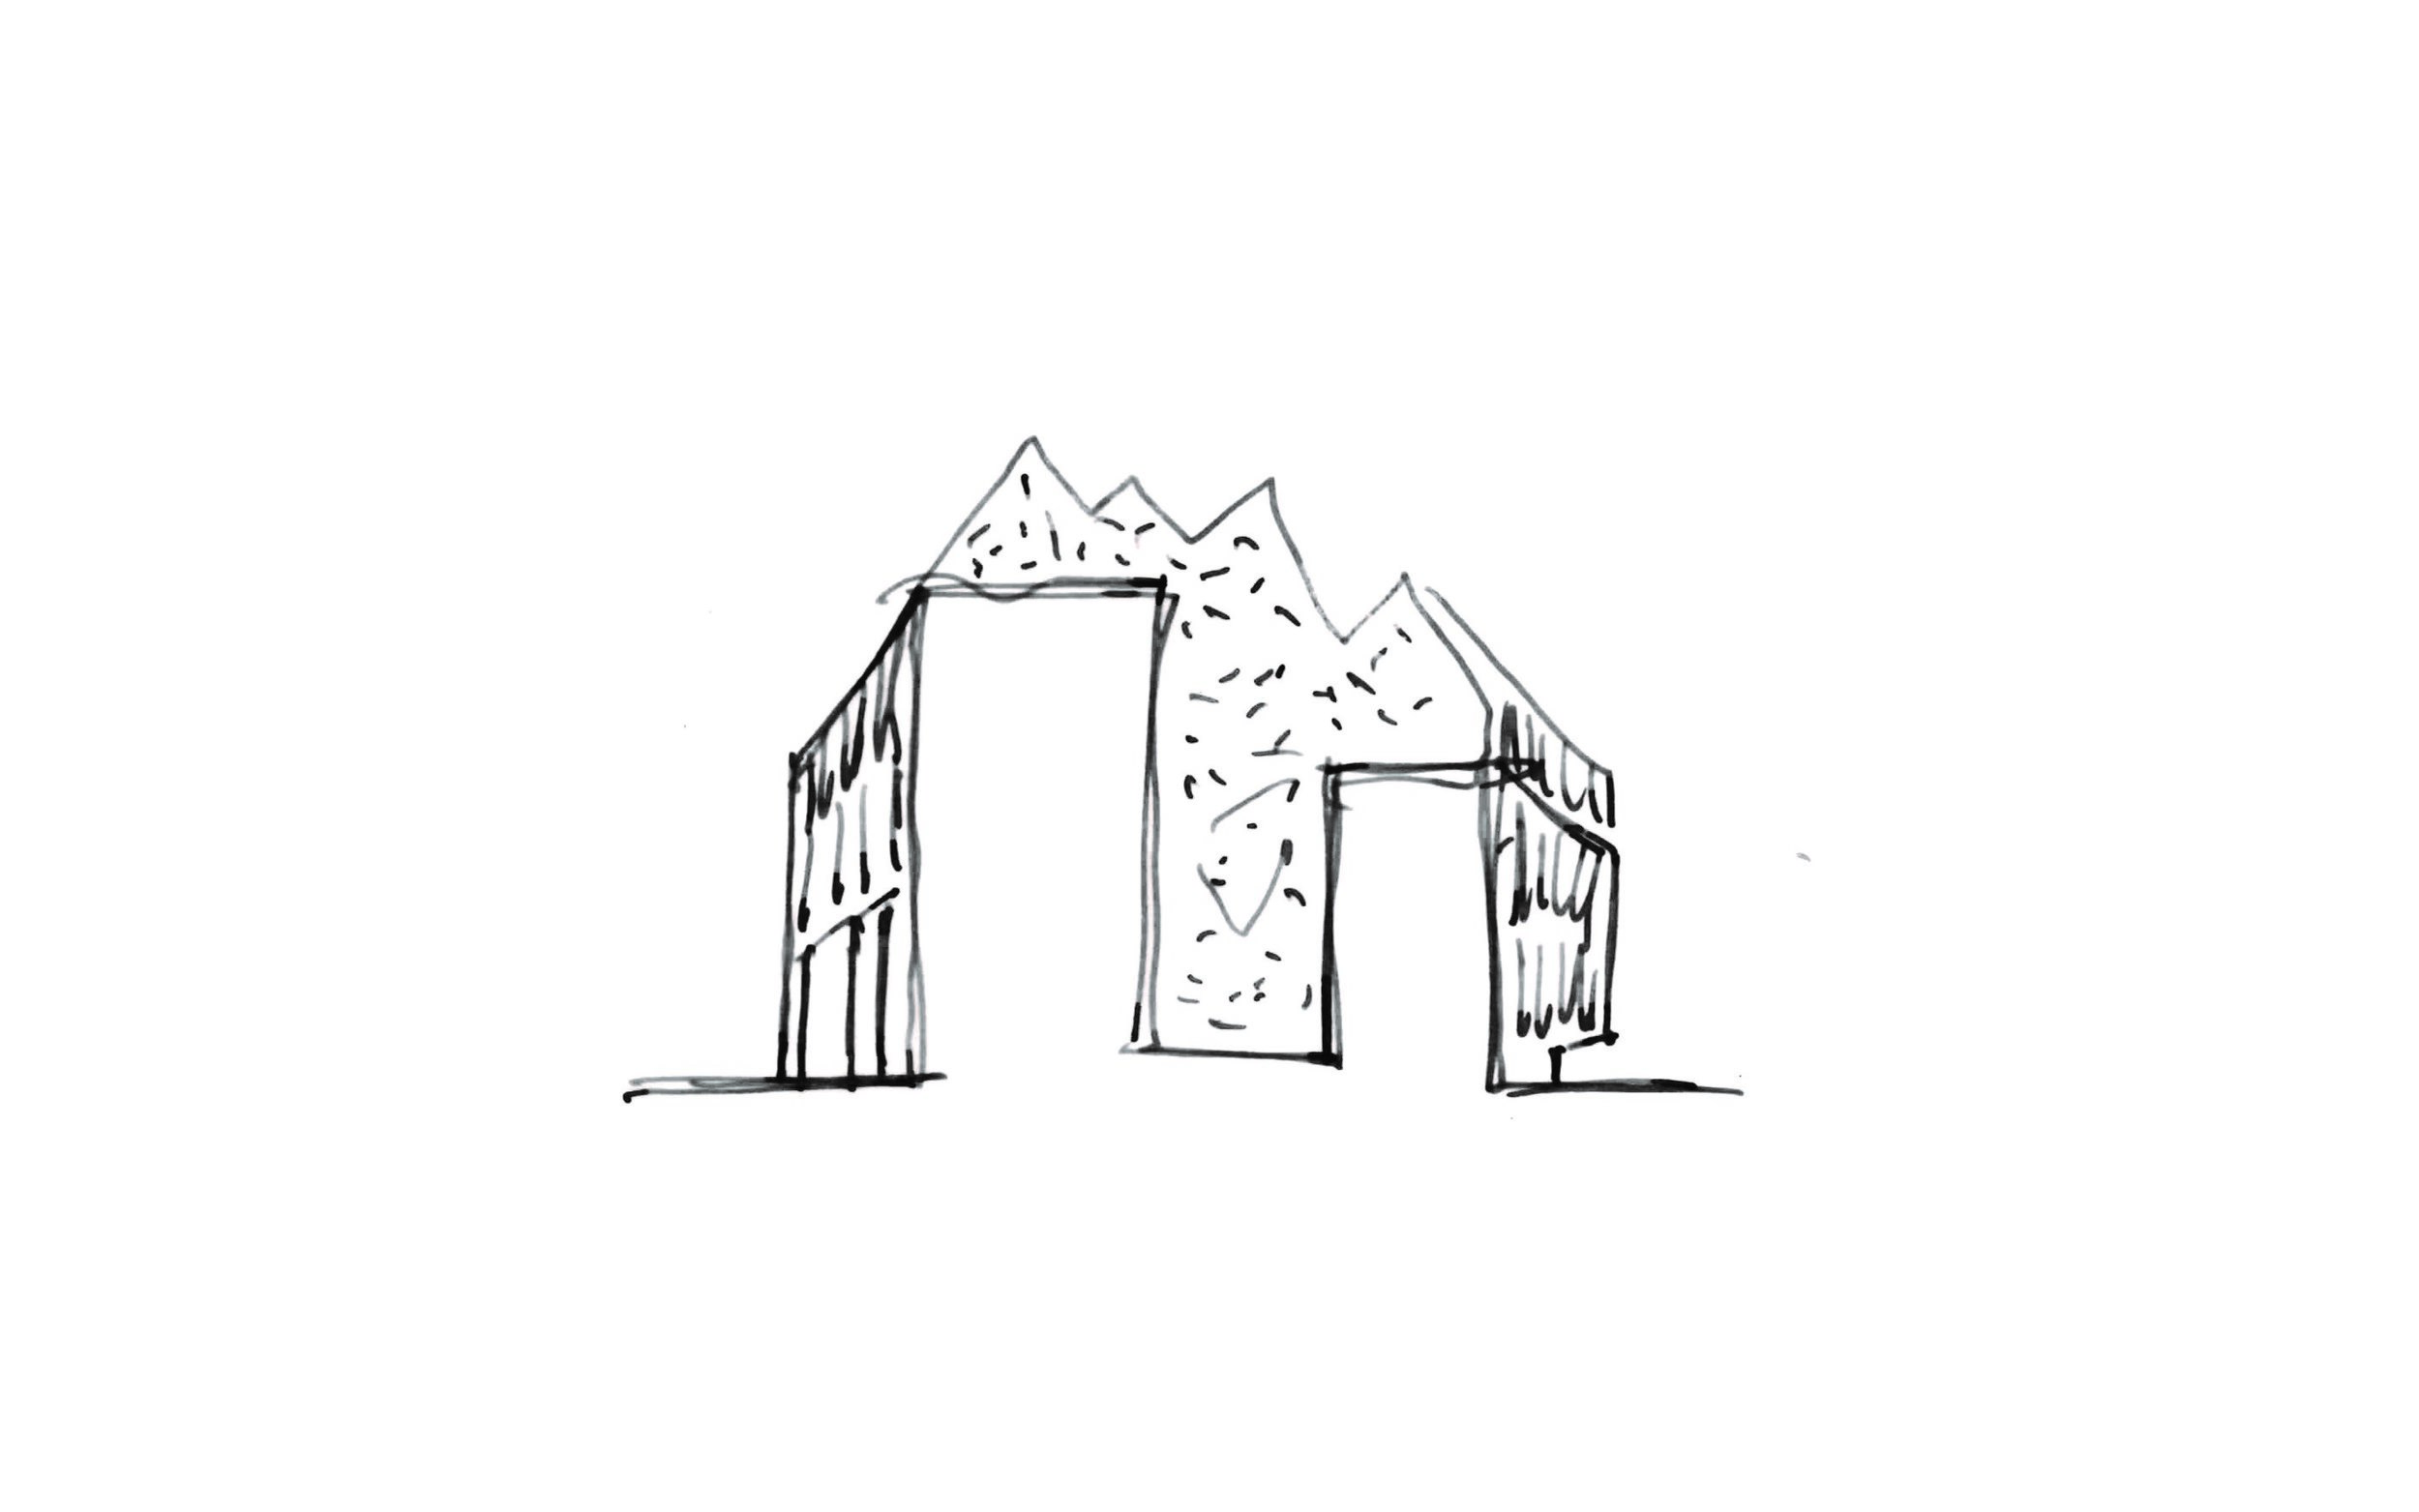 DHOOGE&MEGANCK-DOMUSAUREA-SCHETS1.jpg